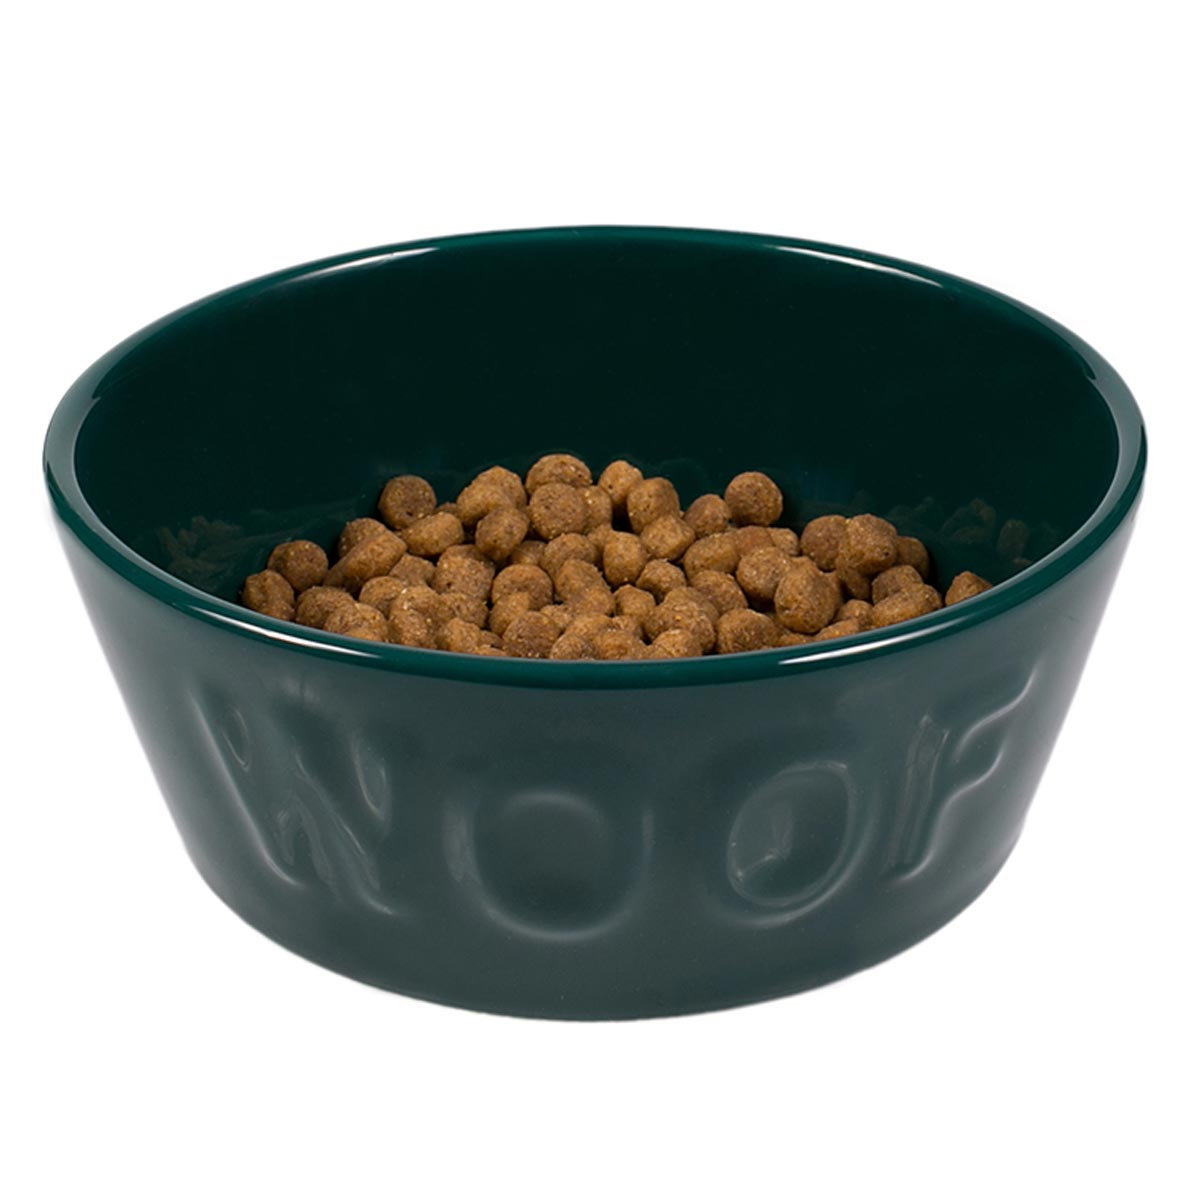 Comedouro Woof para Cachorro e Gato Cerâmica Esmaltado Verde Escuro